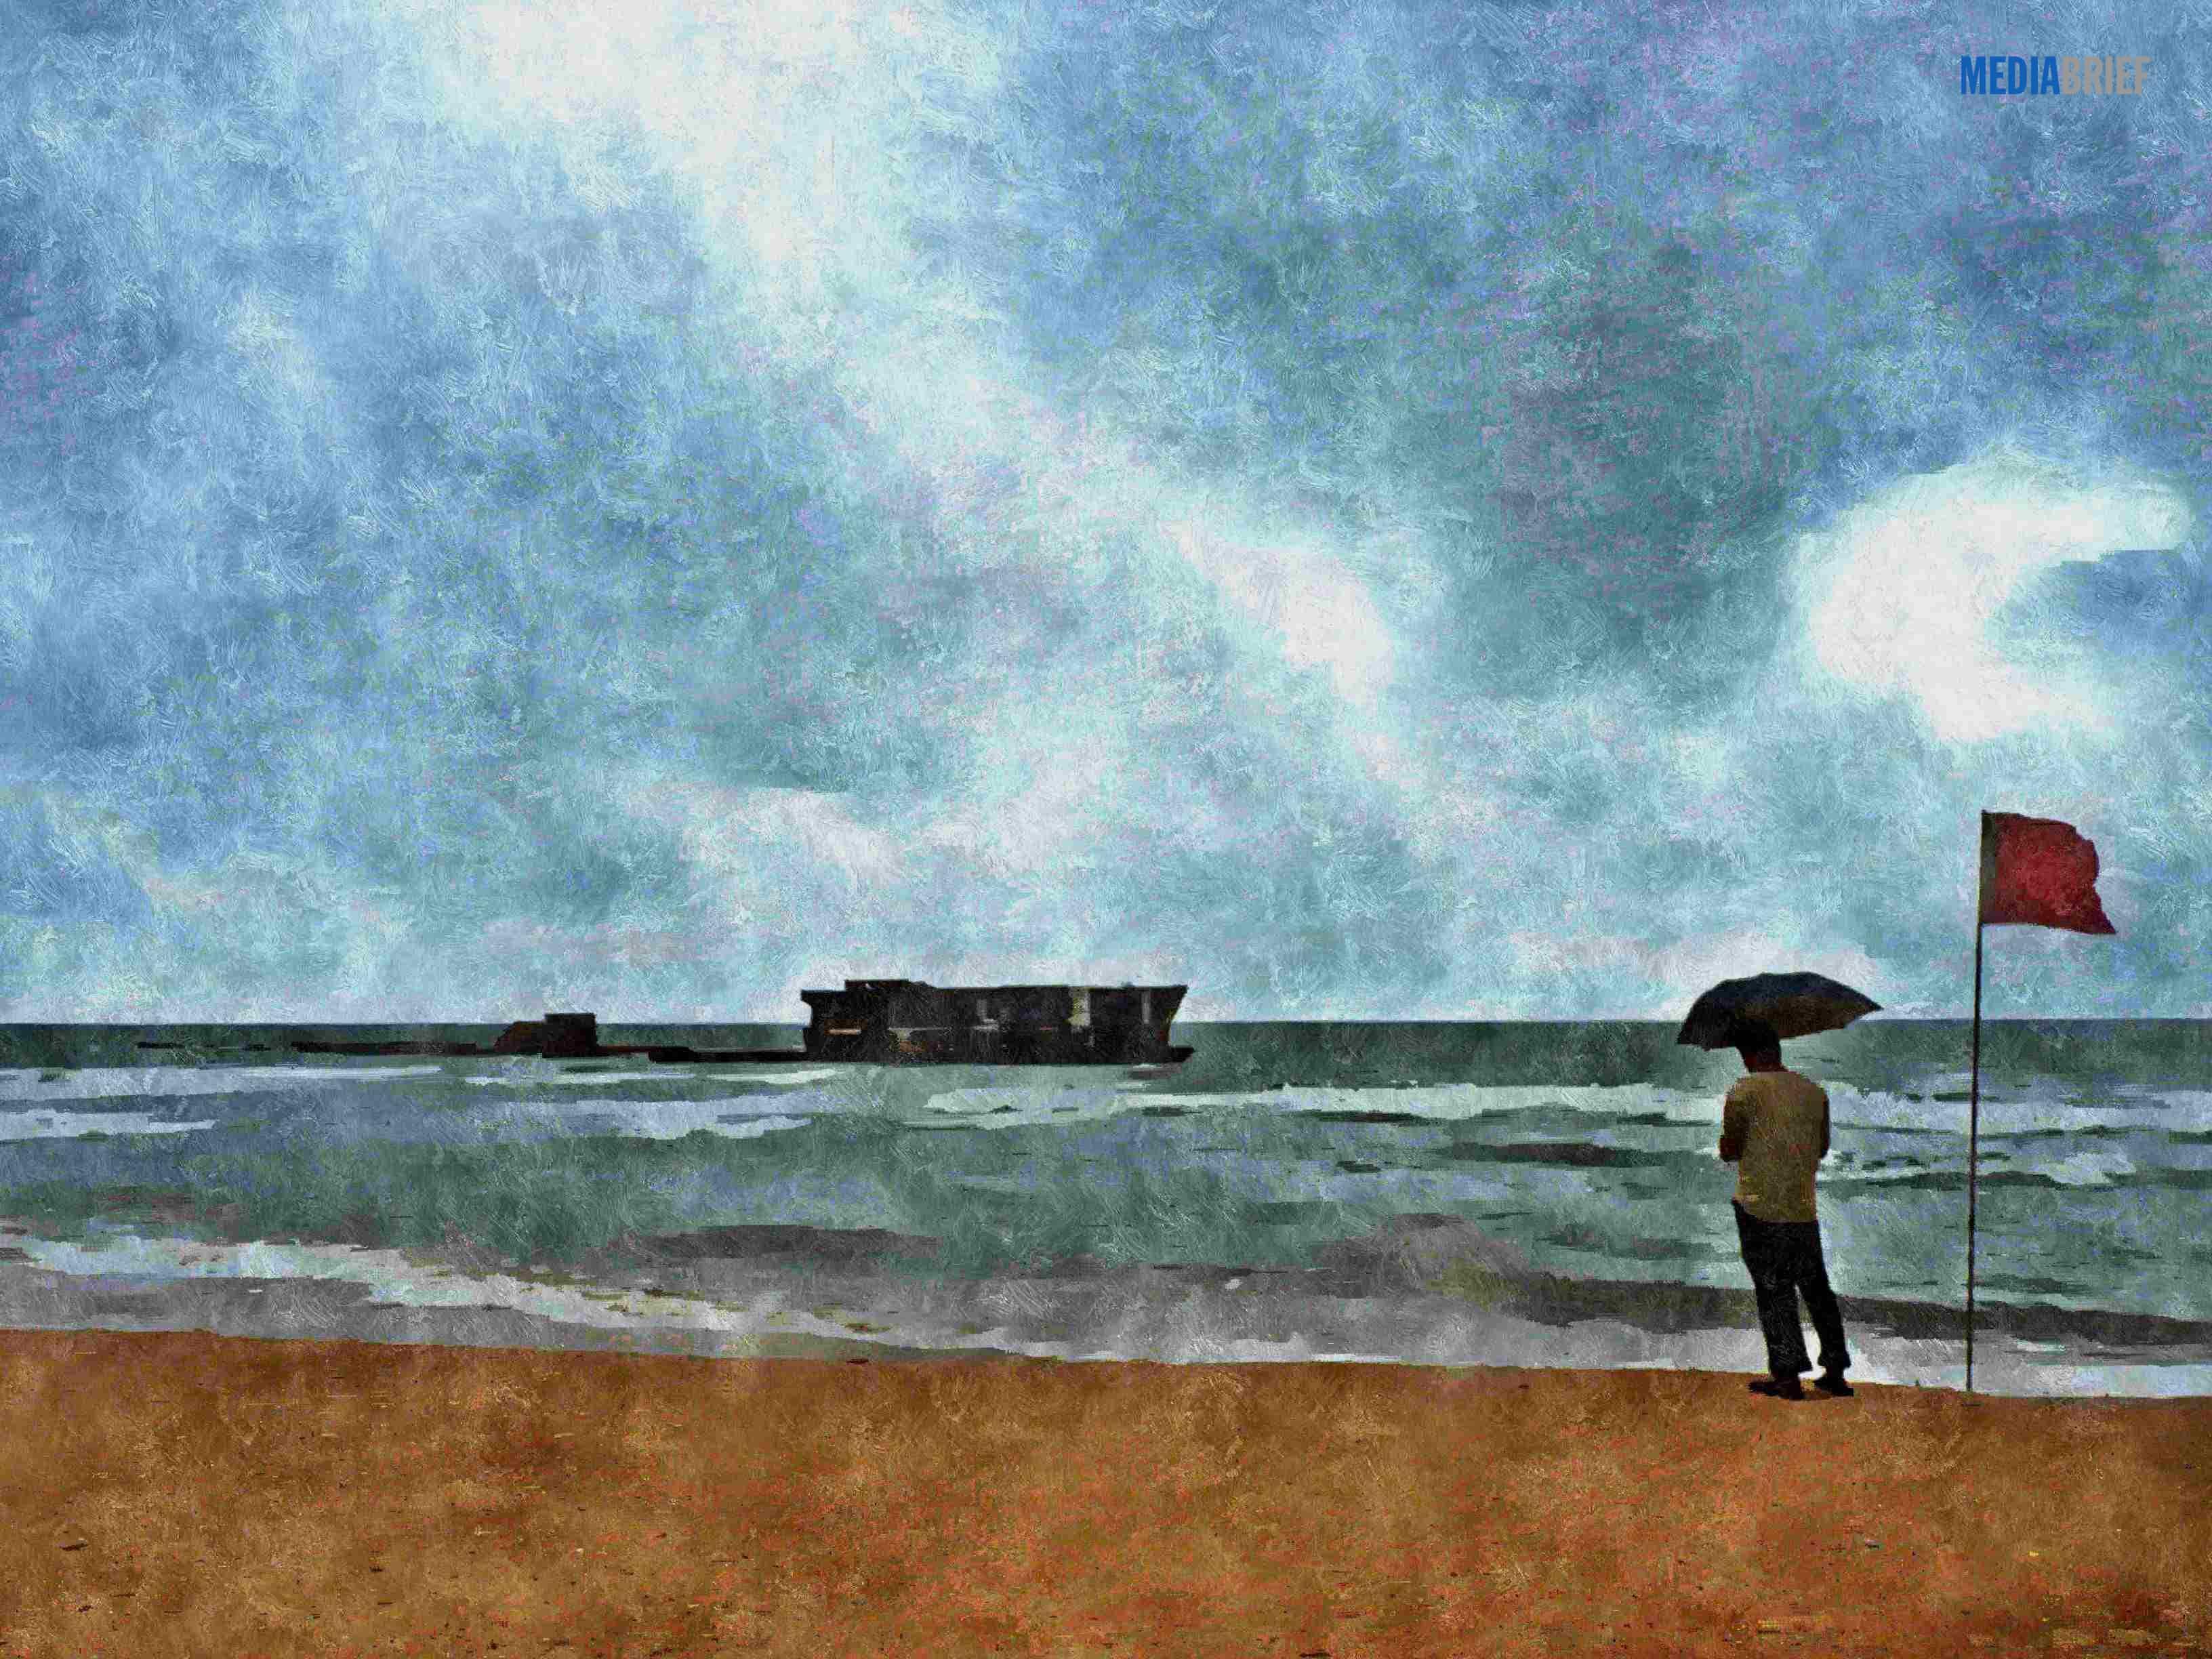 image-MediaBrief-From-Longnosepictures-Mahesh-Ramchandani-01